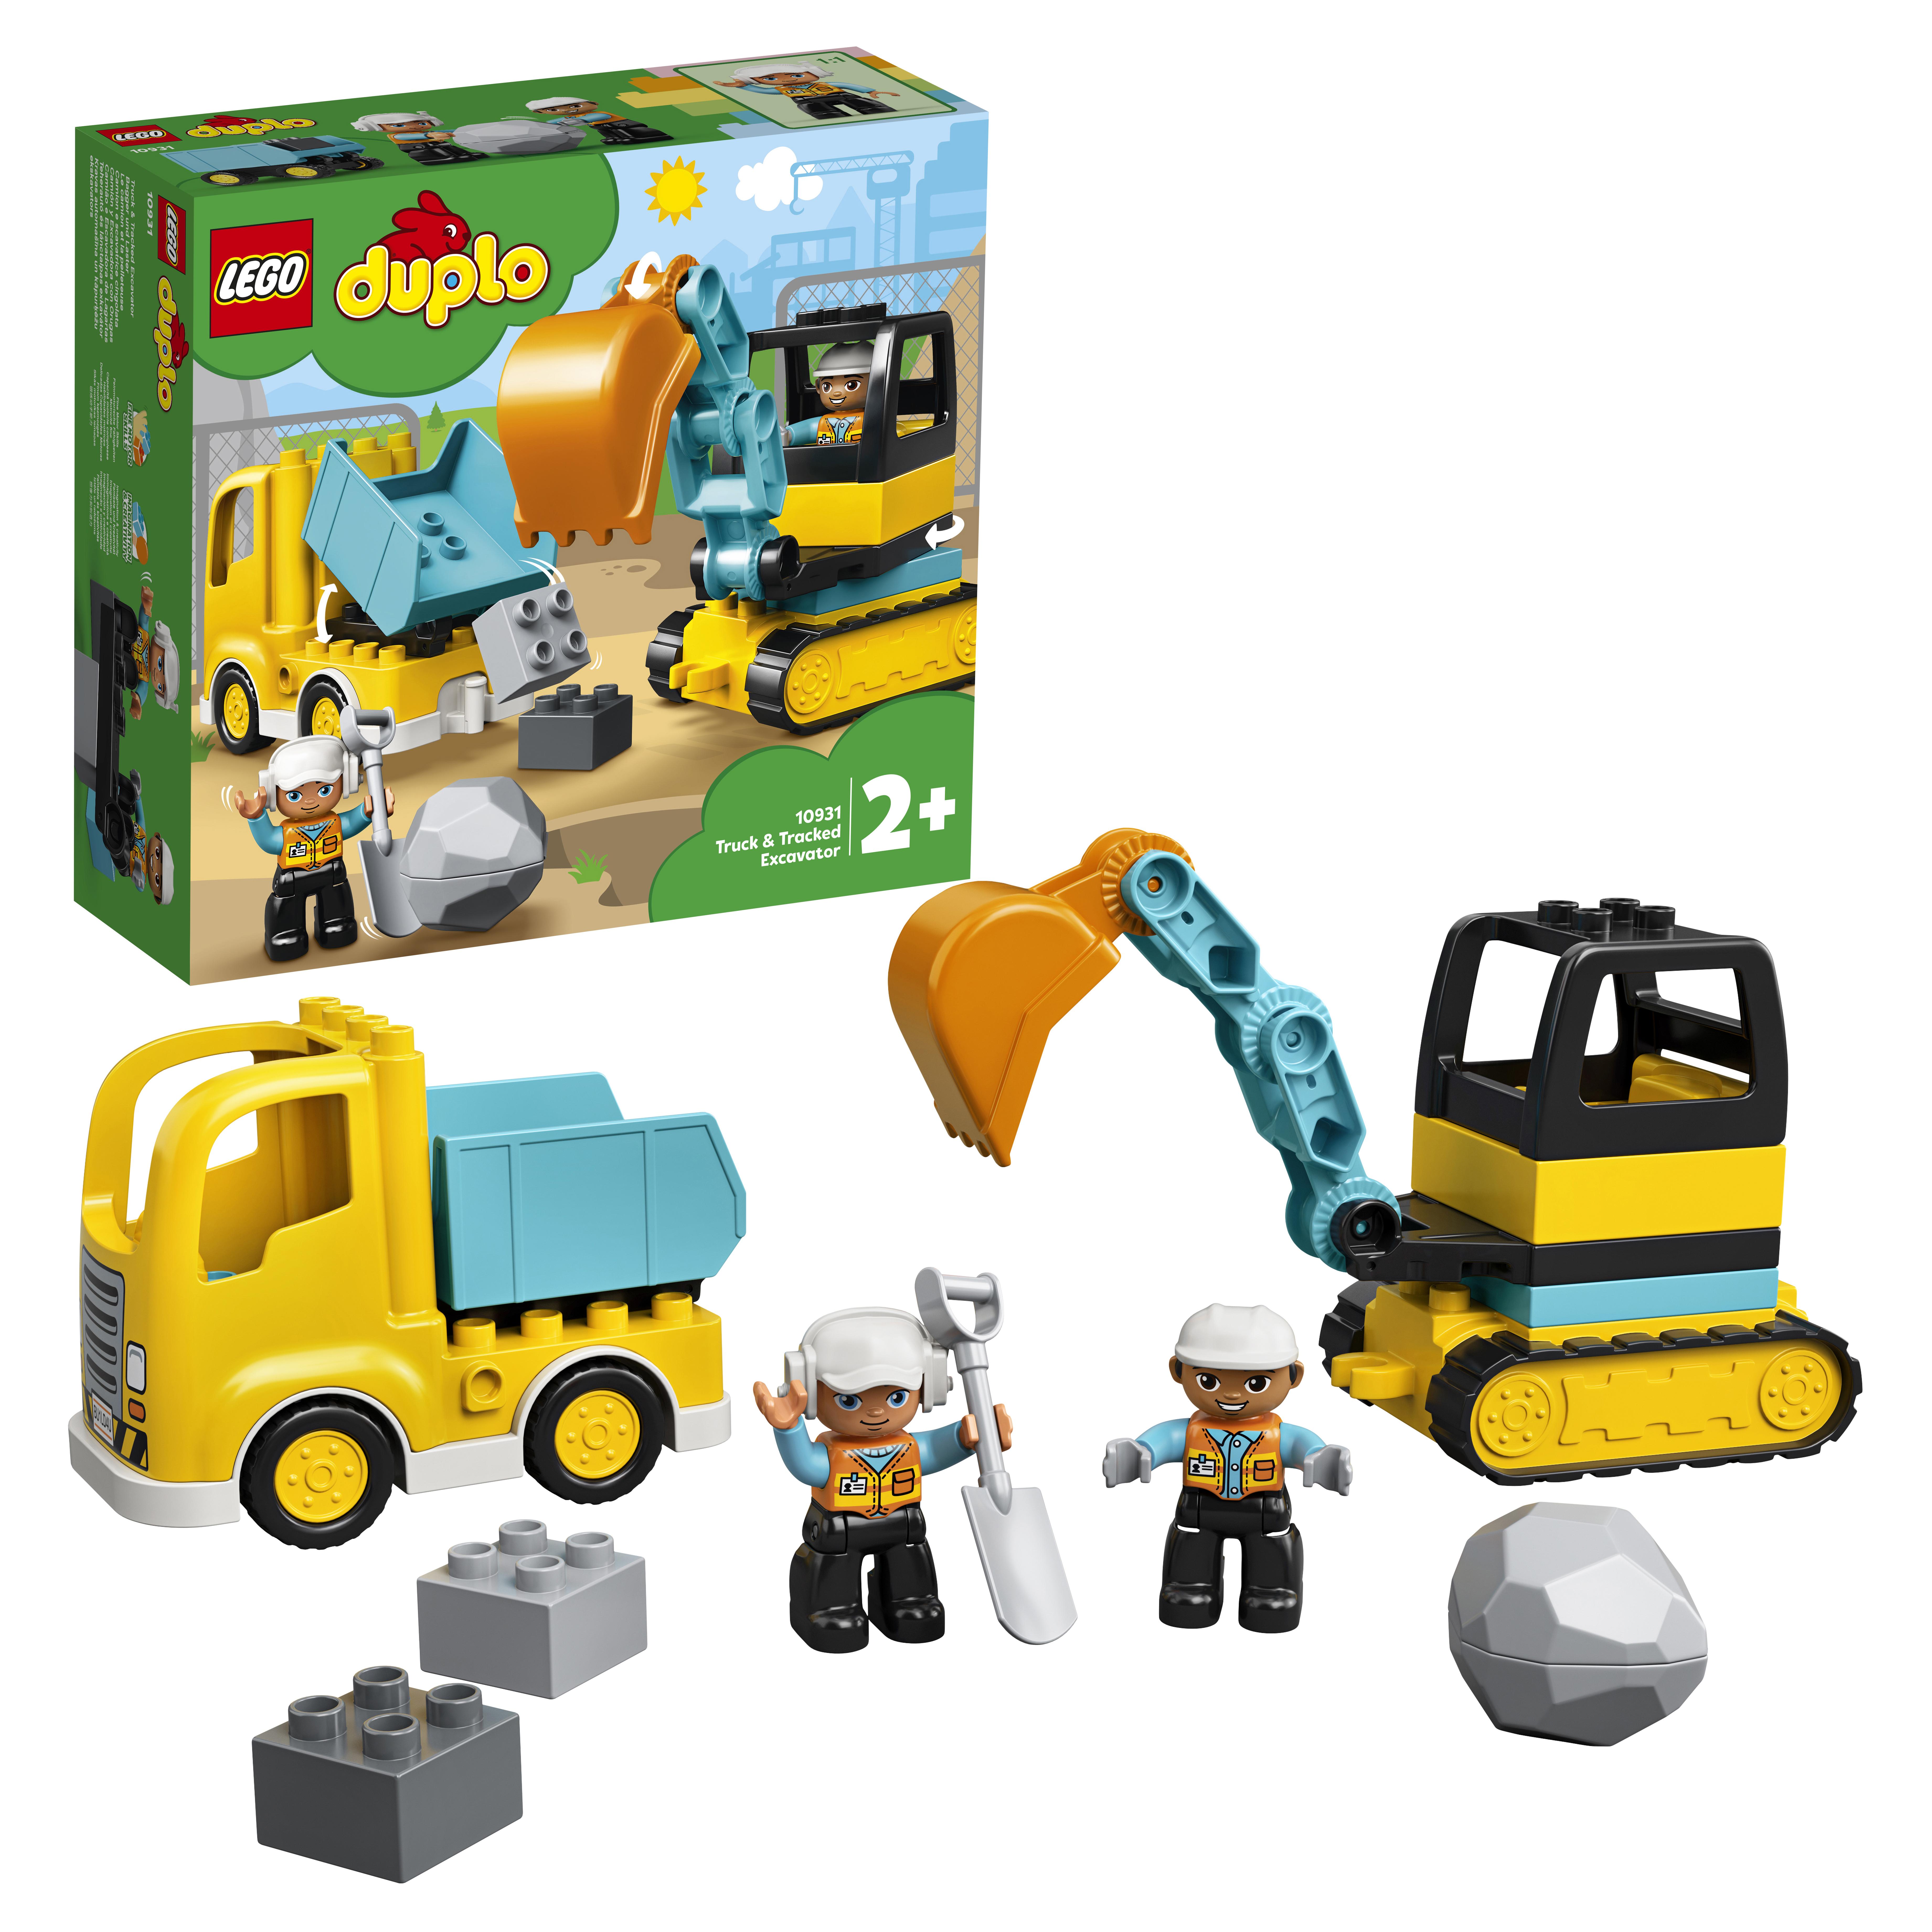 Конструктор LEGO DUPLO Town 10931 Грузовик